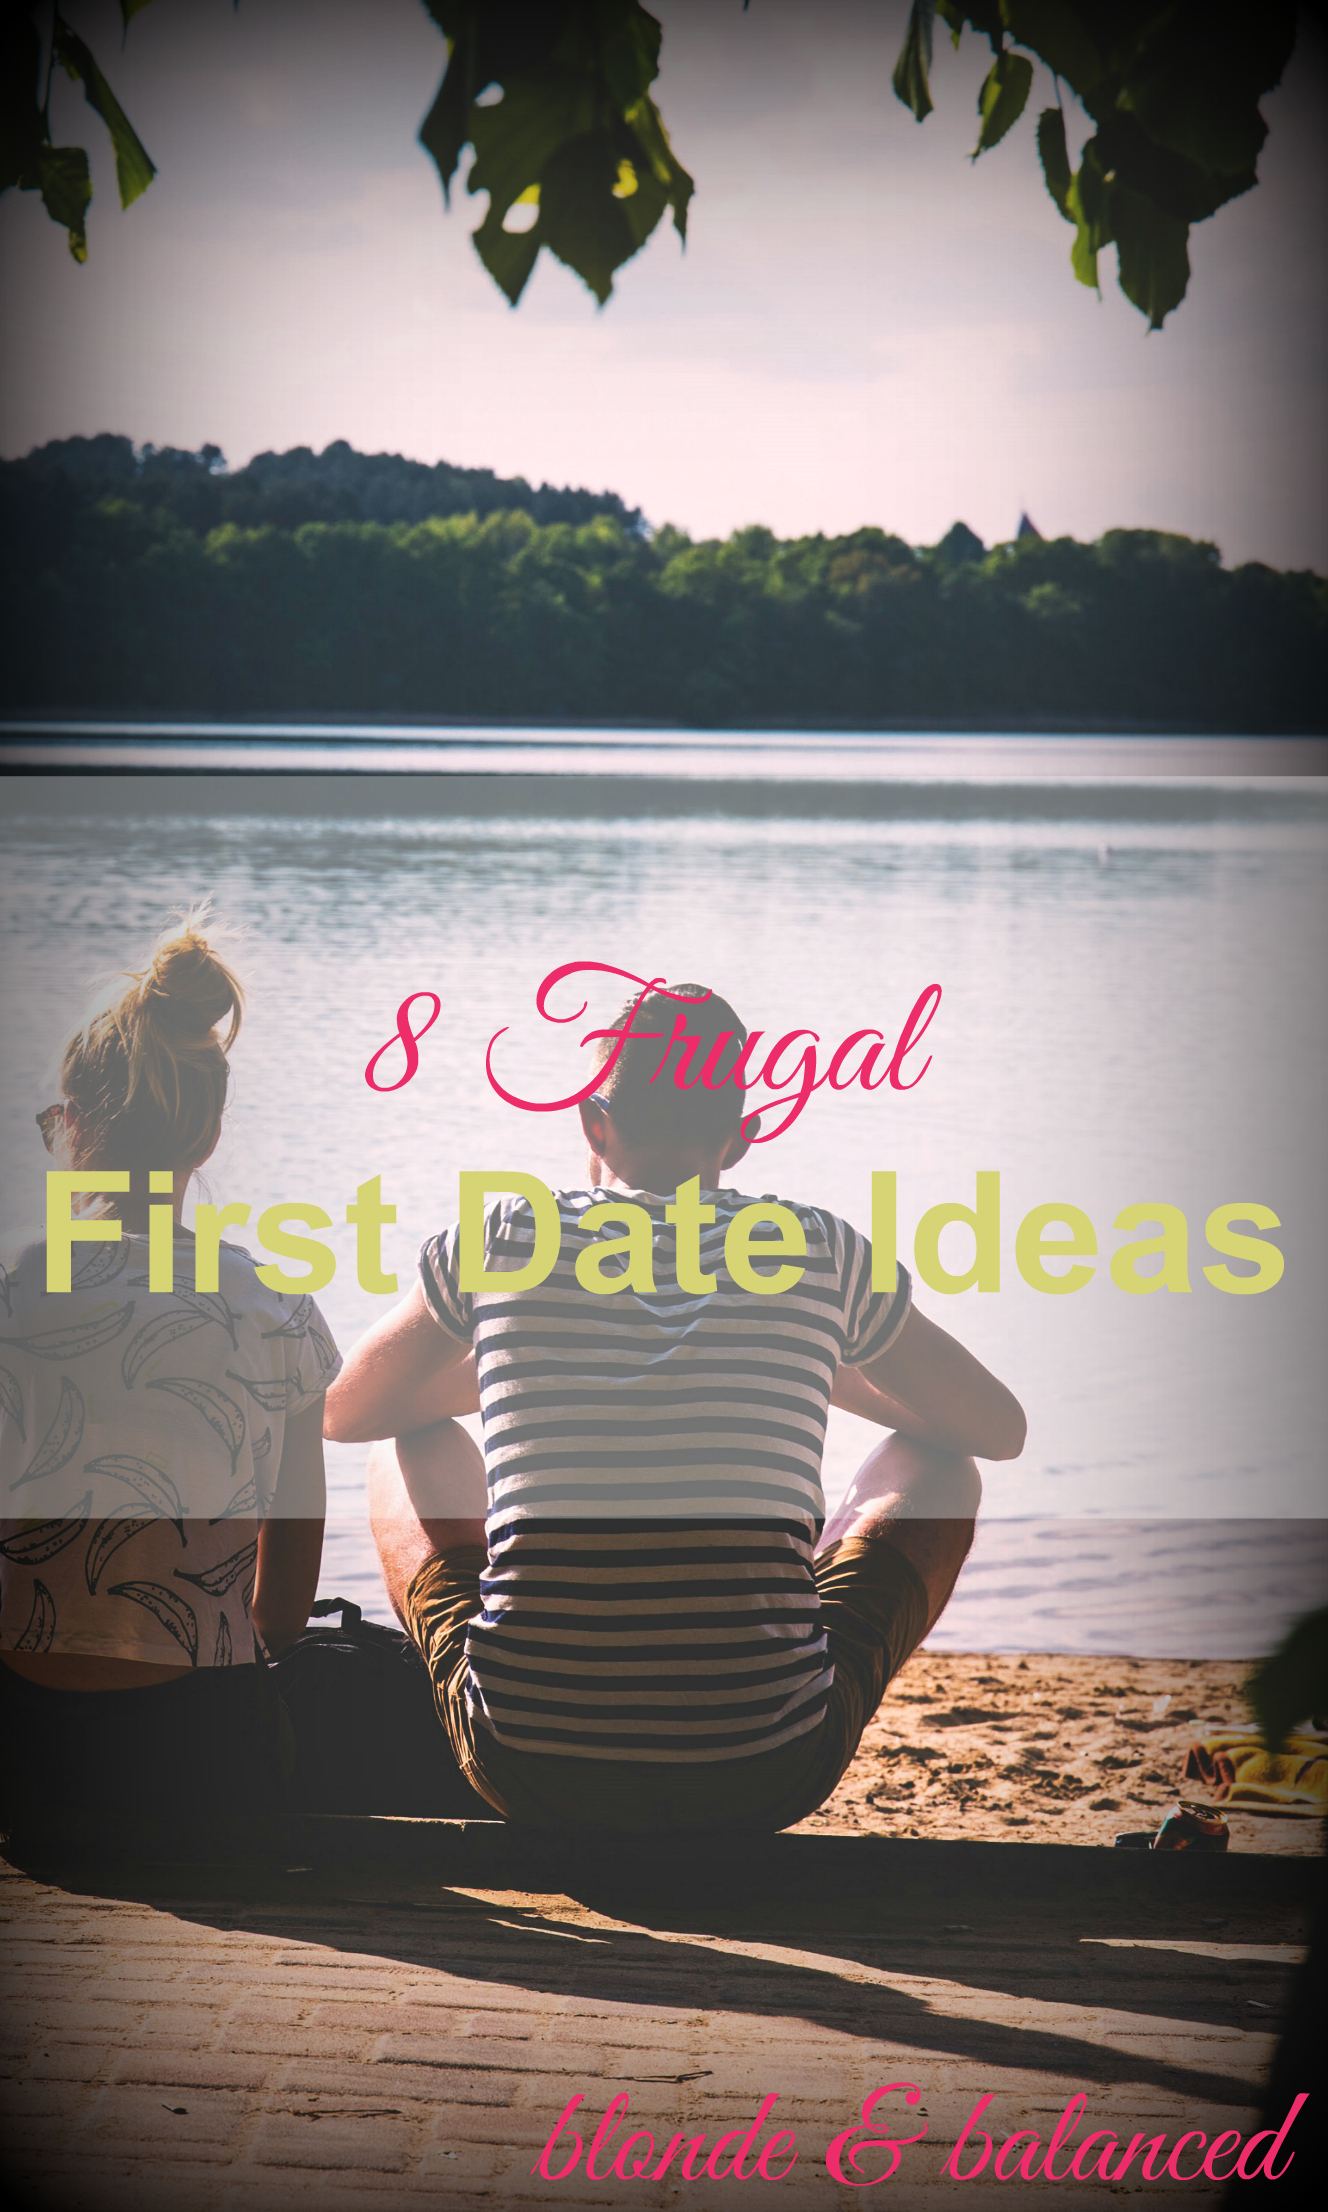 First dates ideas